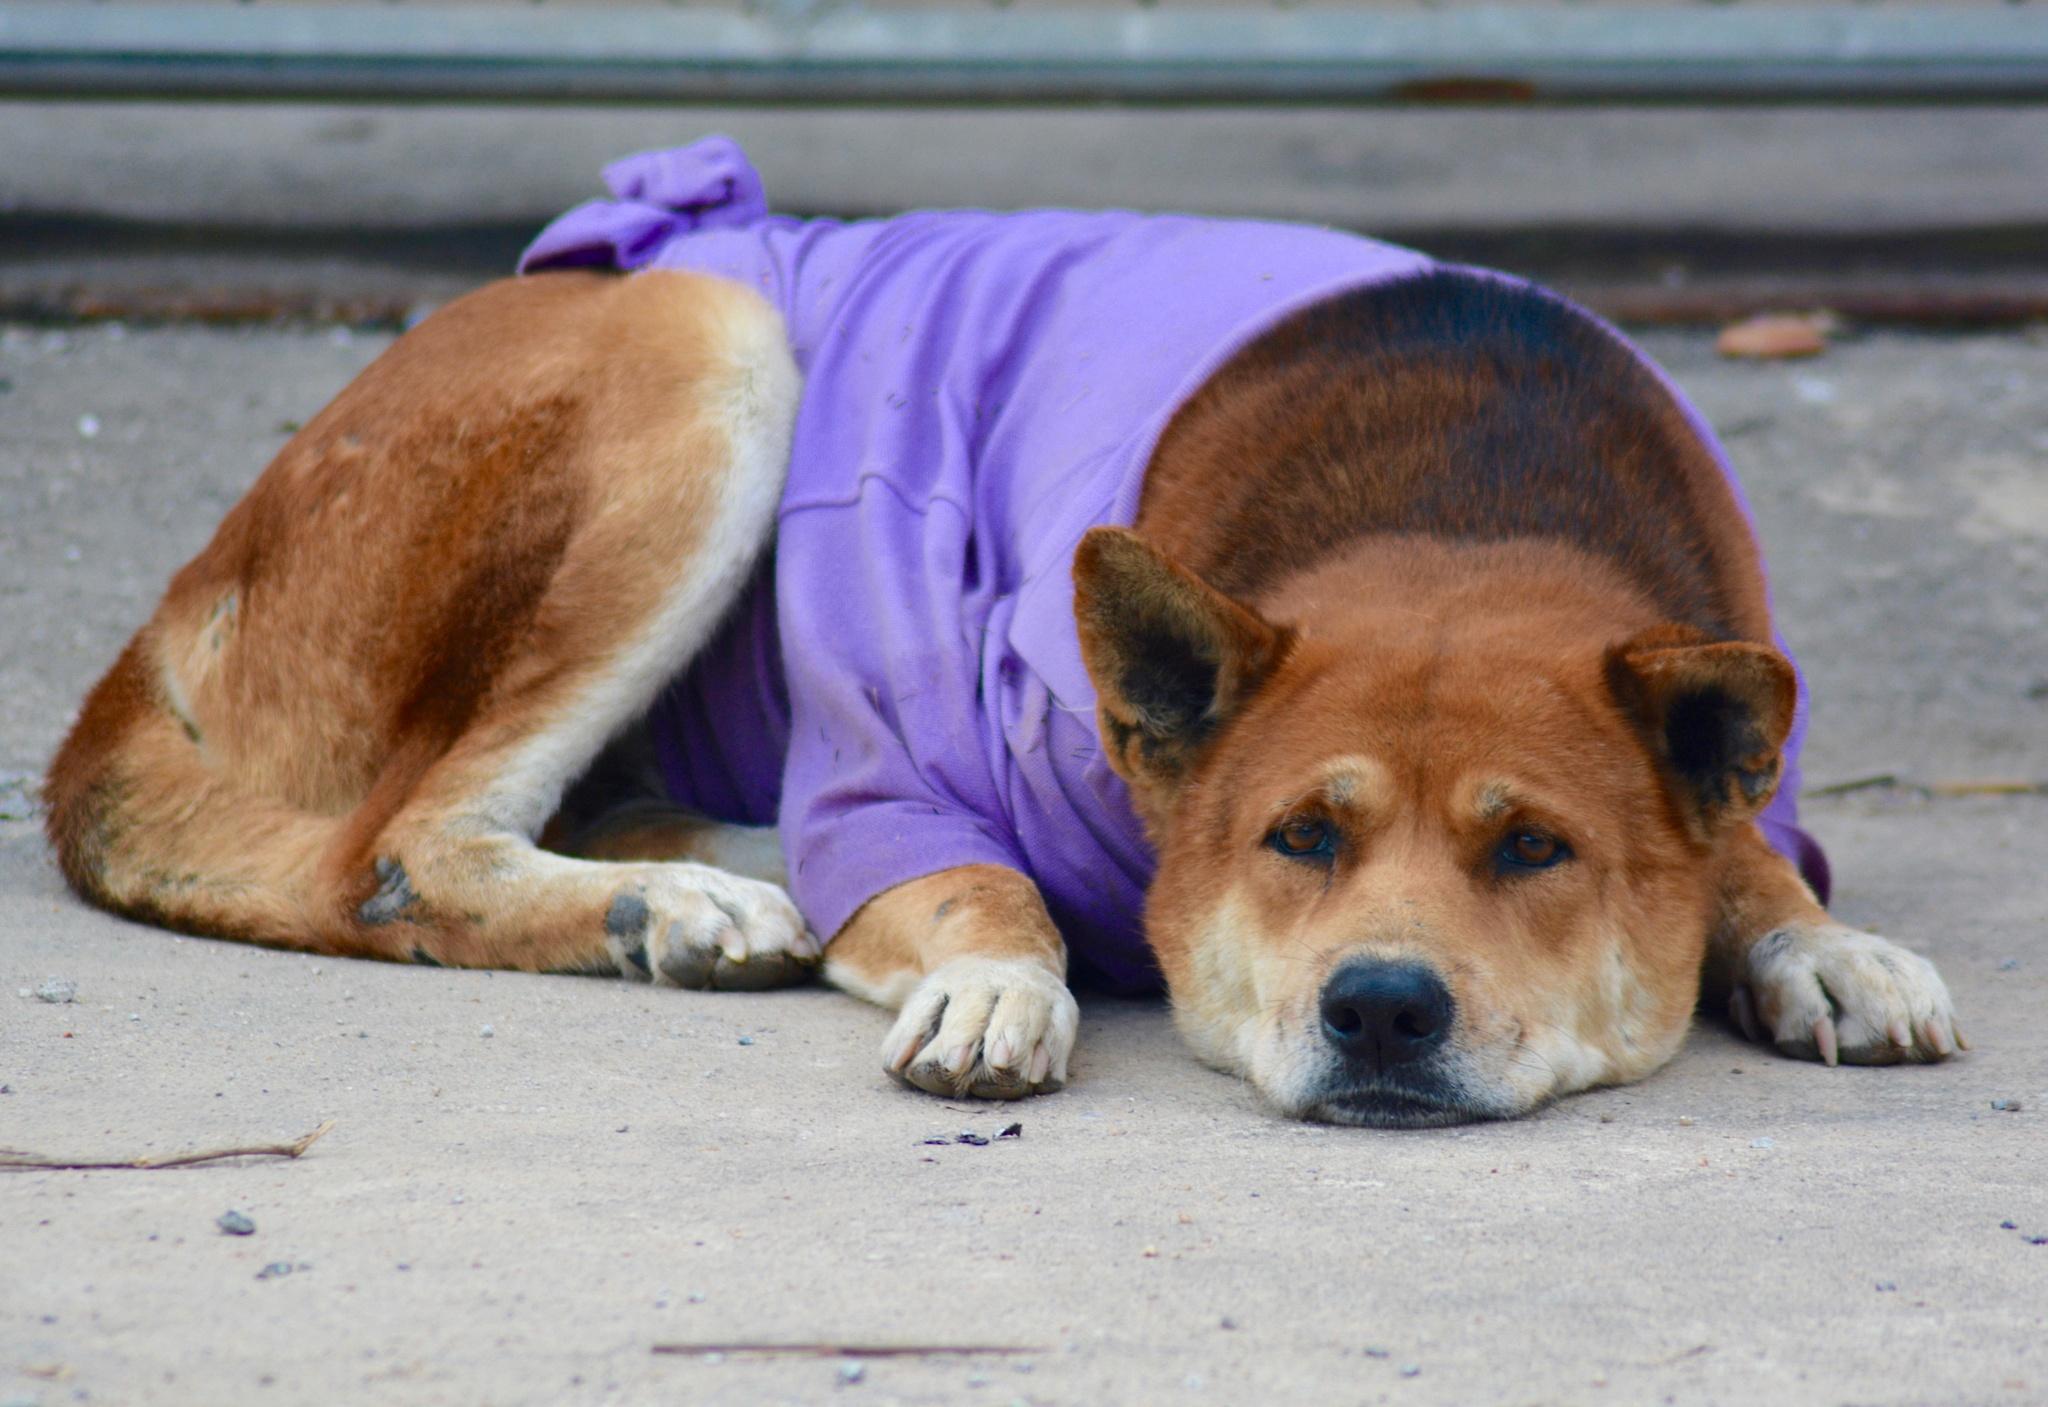 Street Dog by Frank Brande